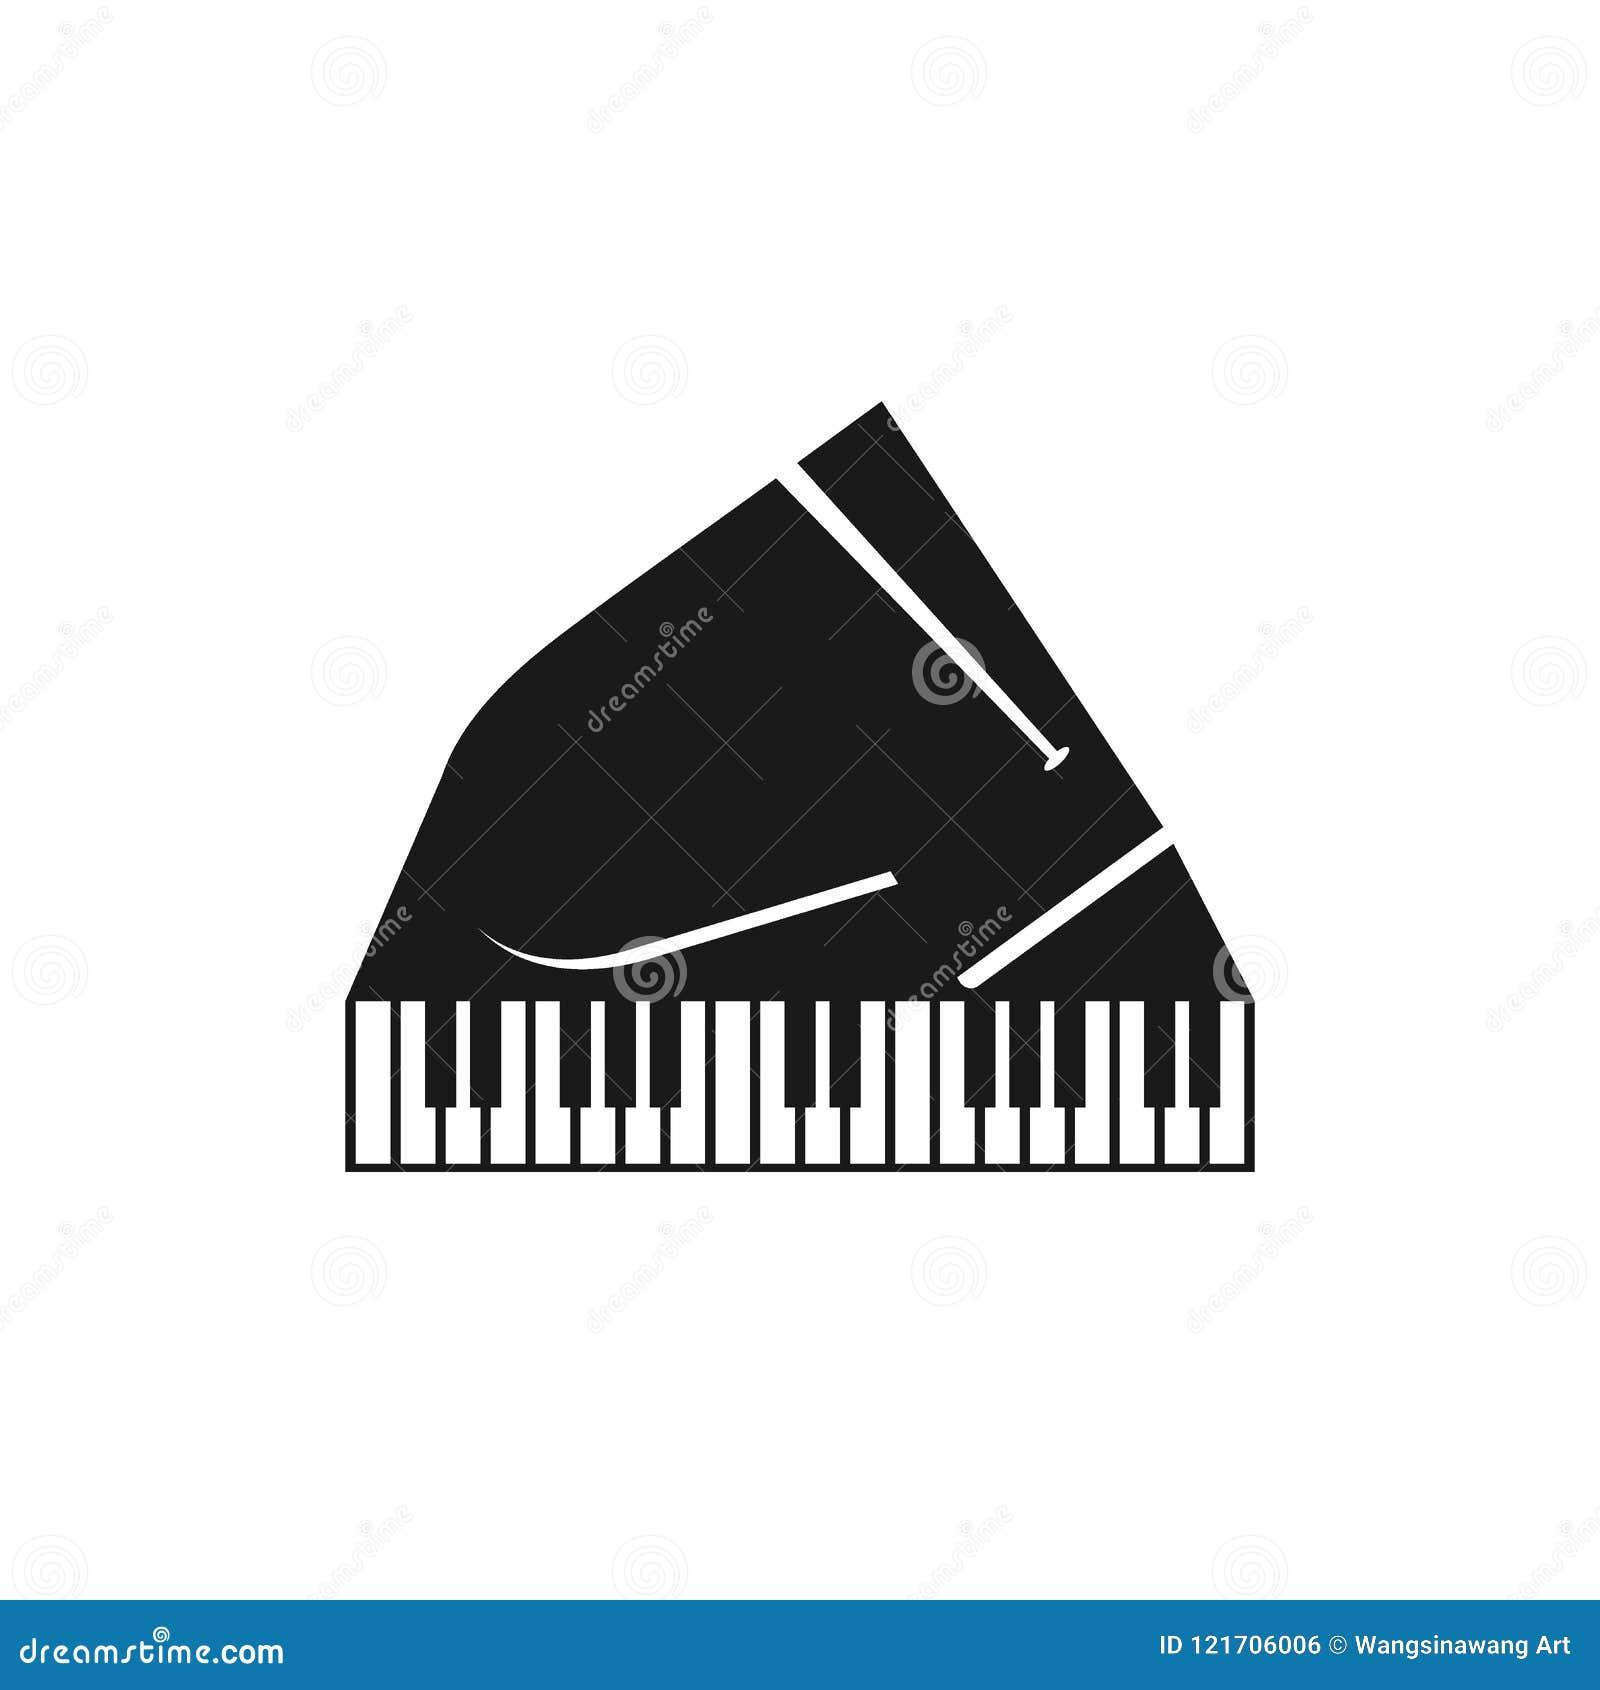 Piano logo stock vector  Illustration of voice, contour - 121706006